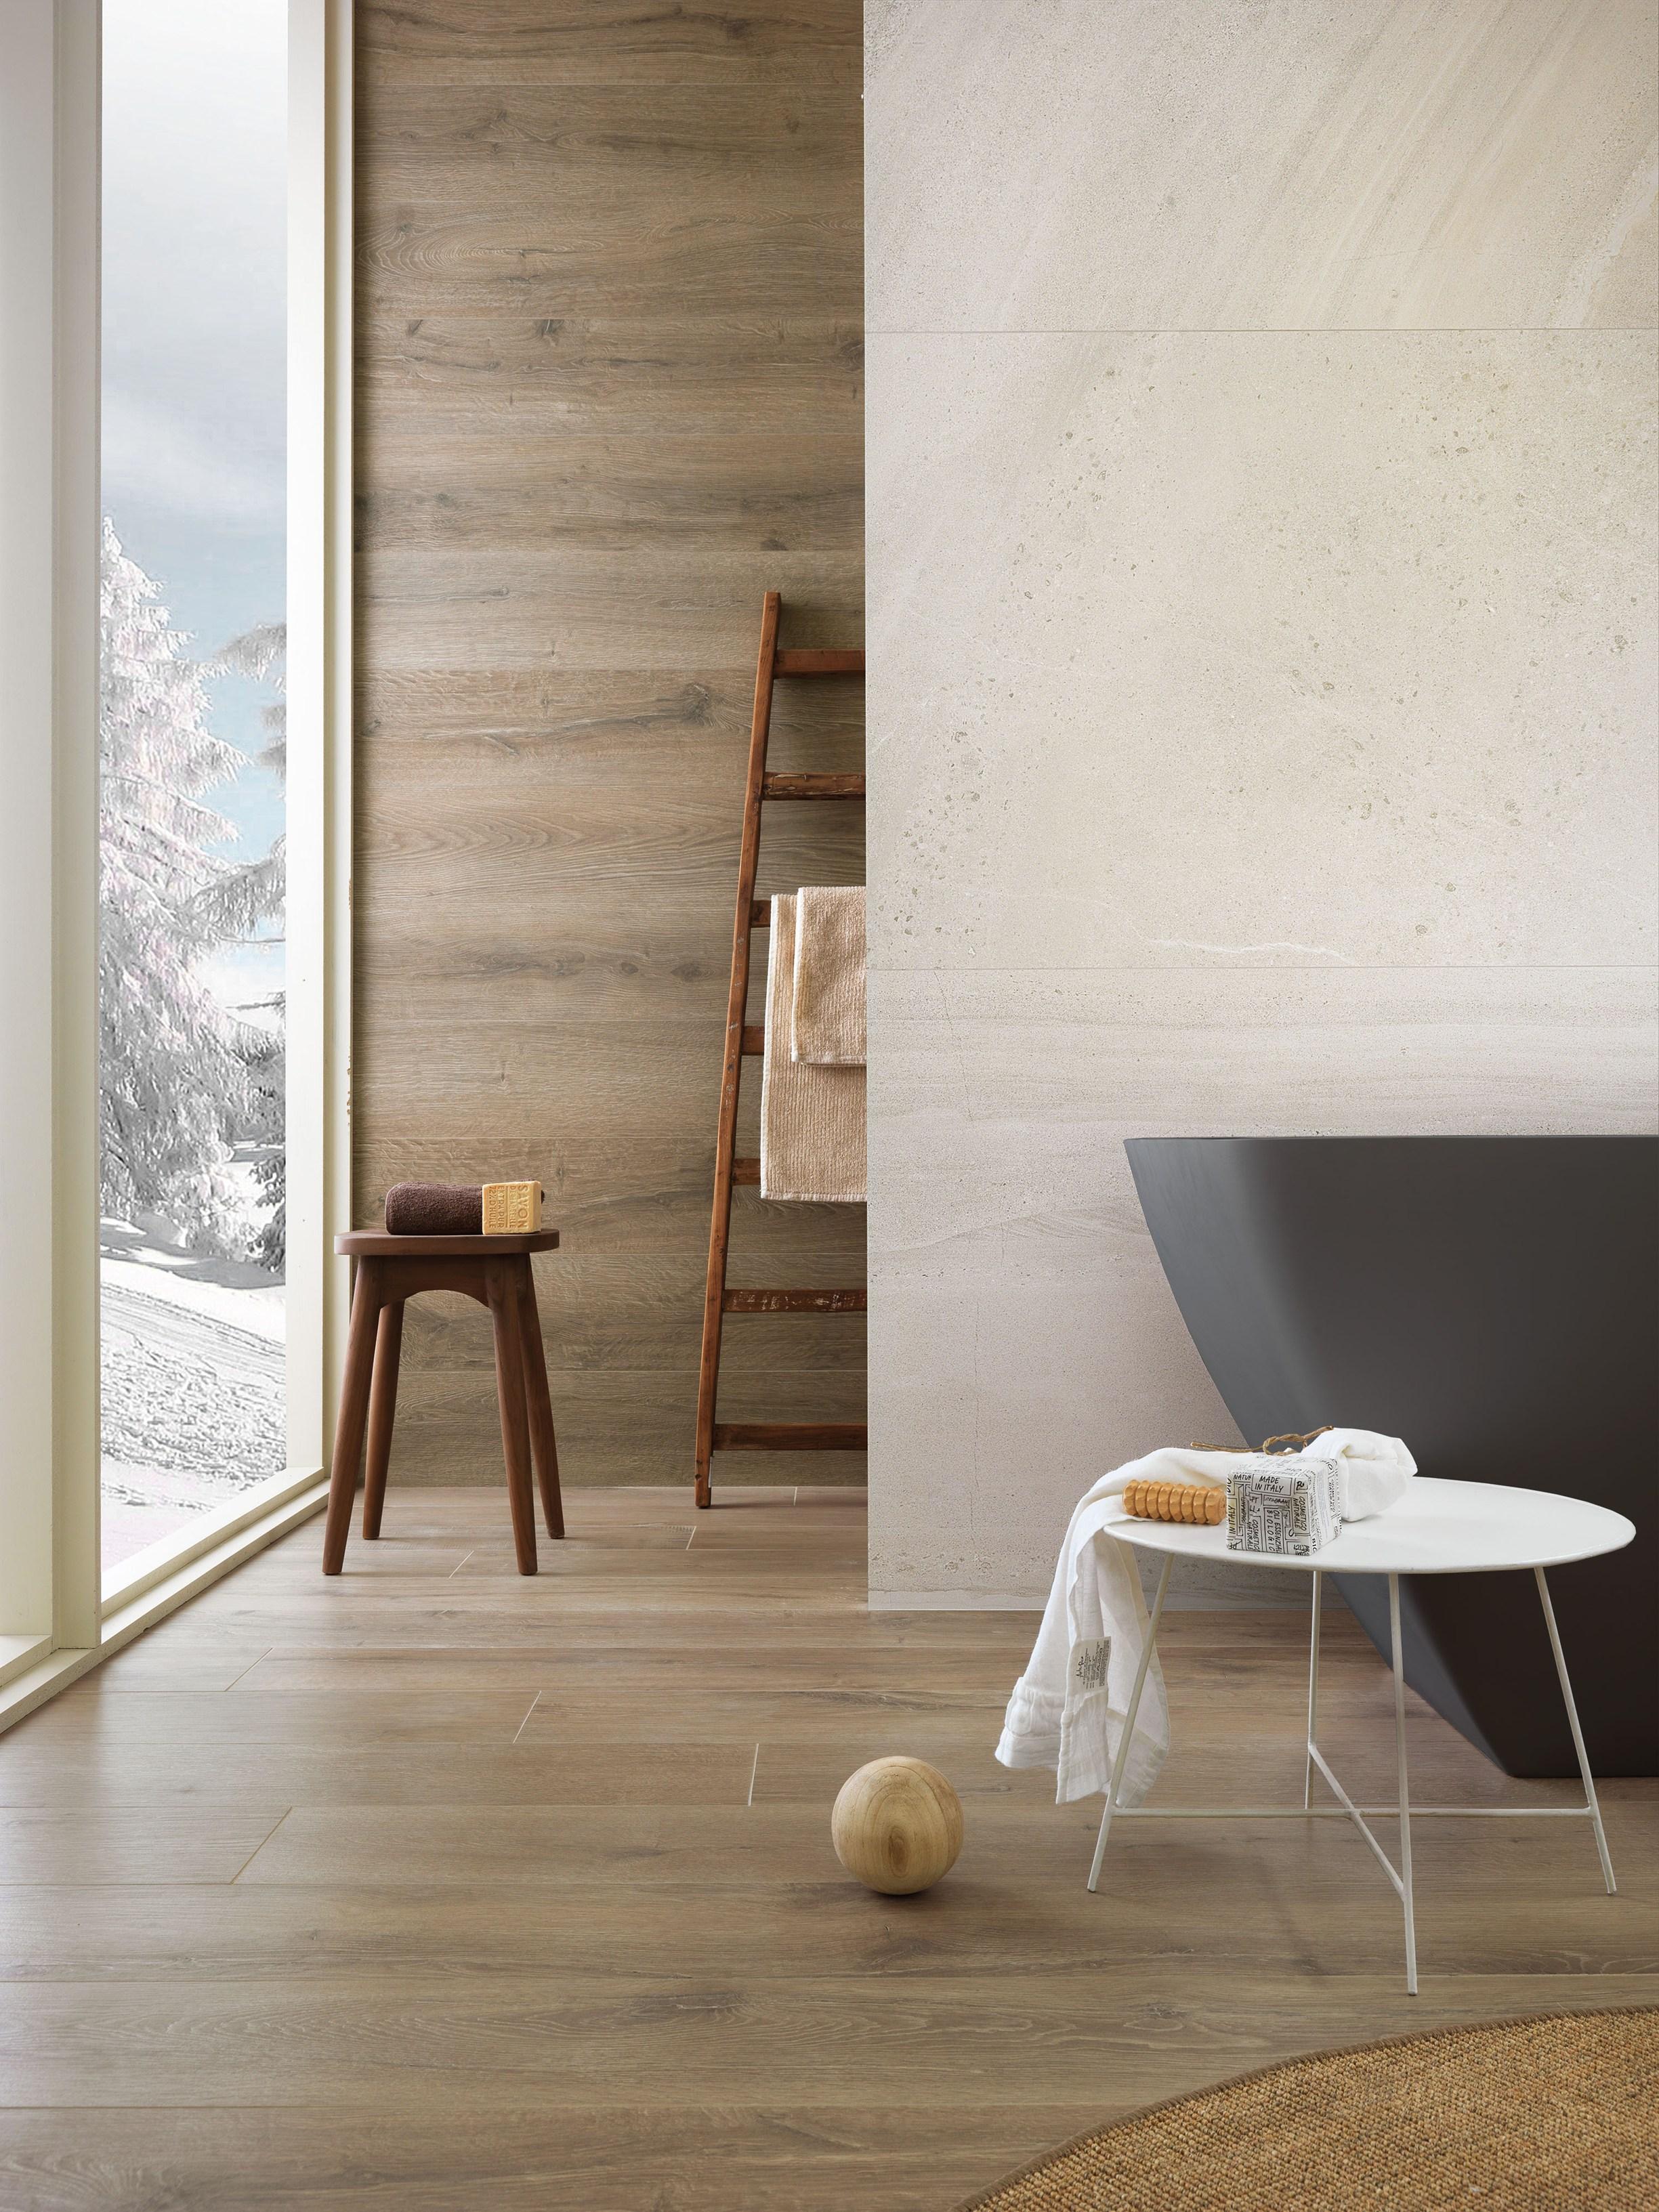 Salle de bain n 2 sol carrelage imitation parquet aulne ma for Carrelage salle de bain imitation pierre